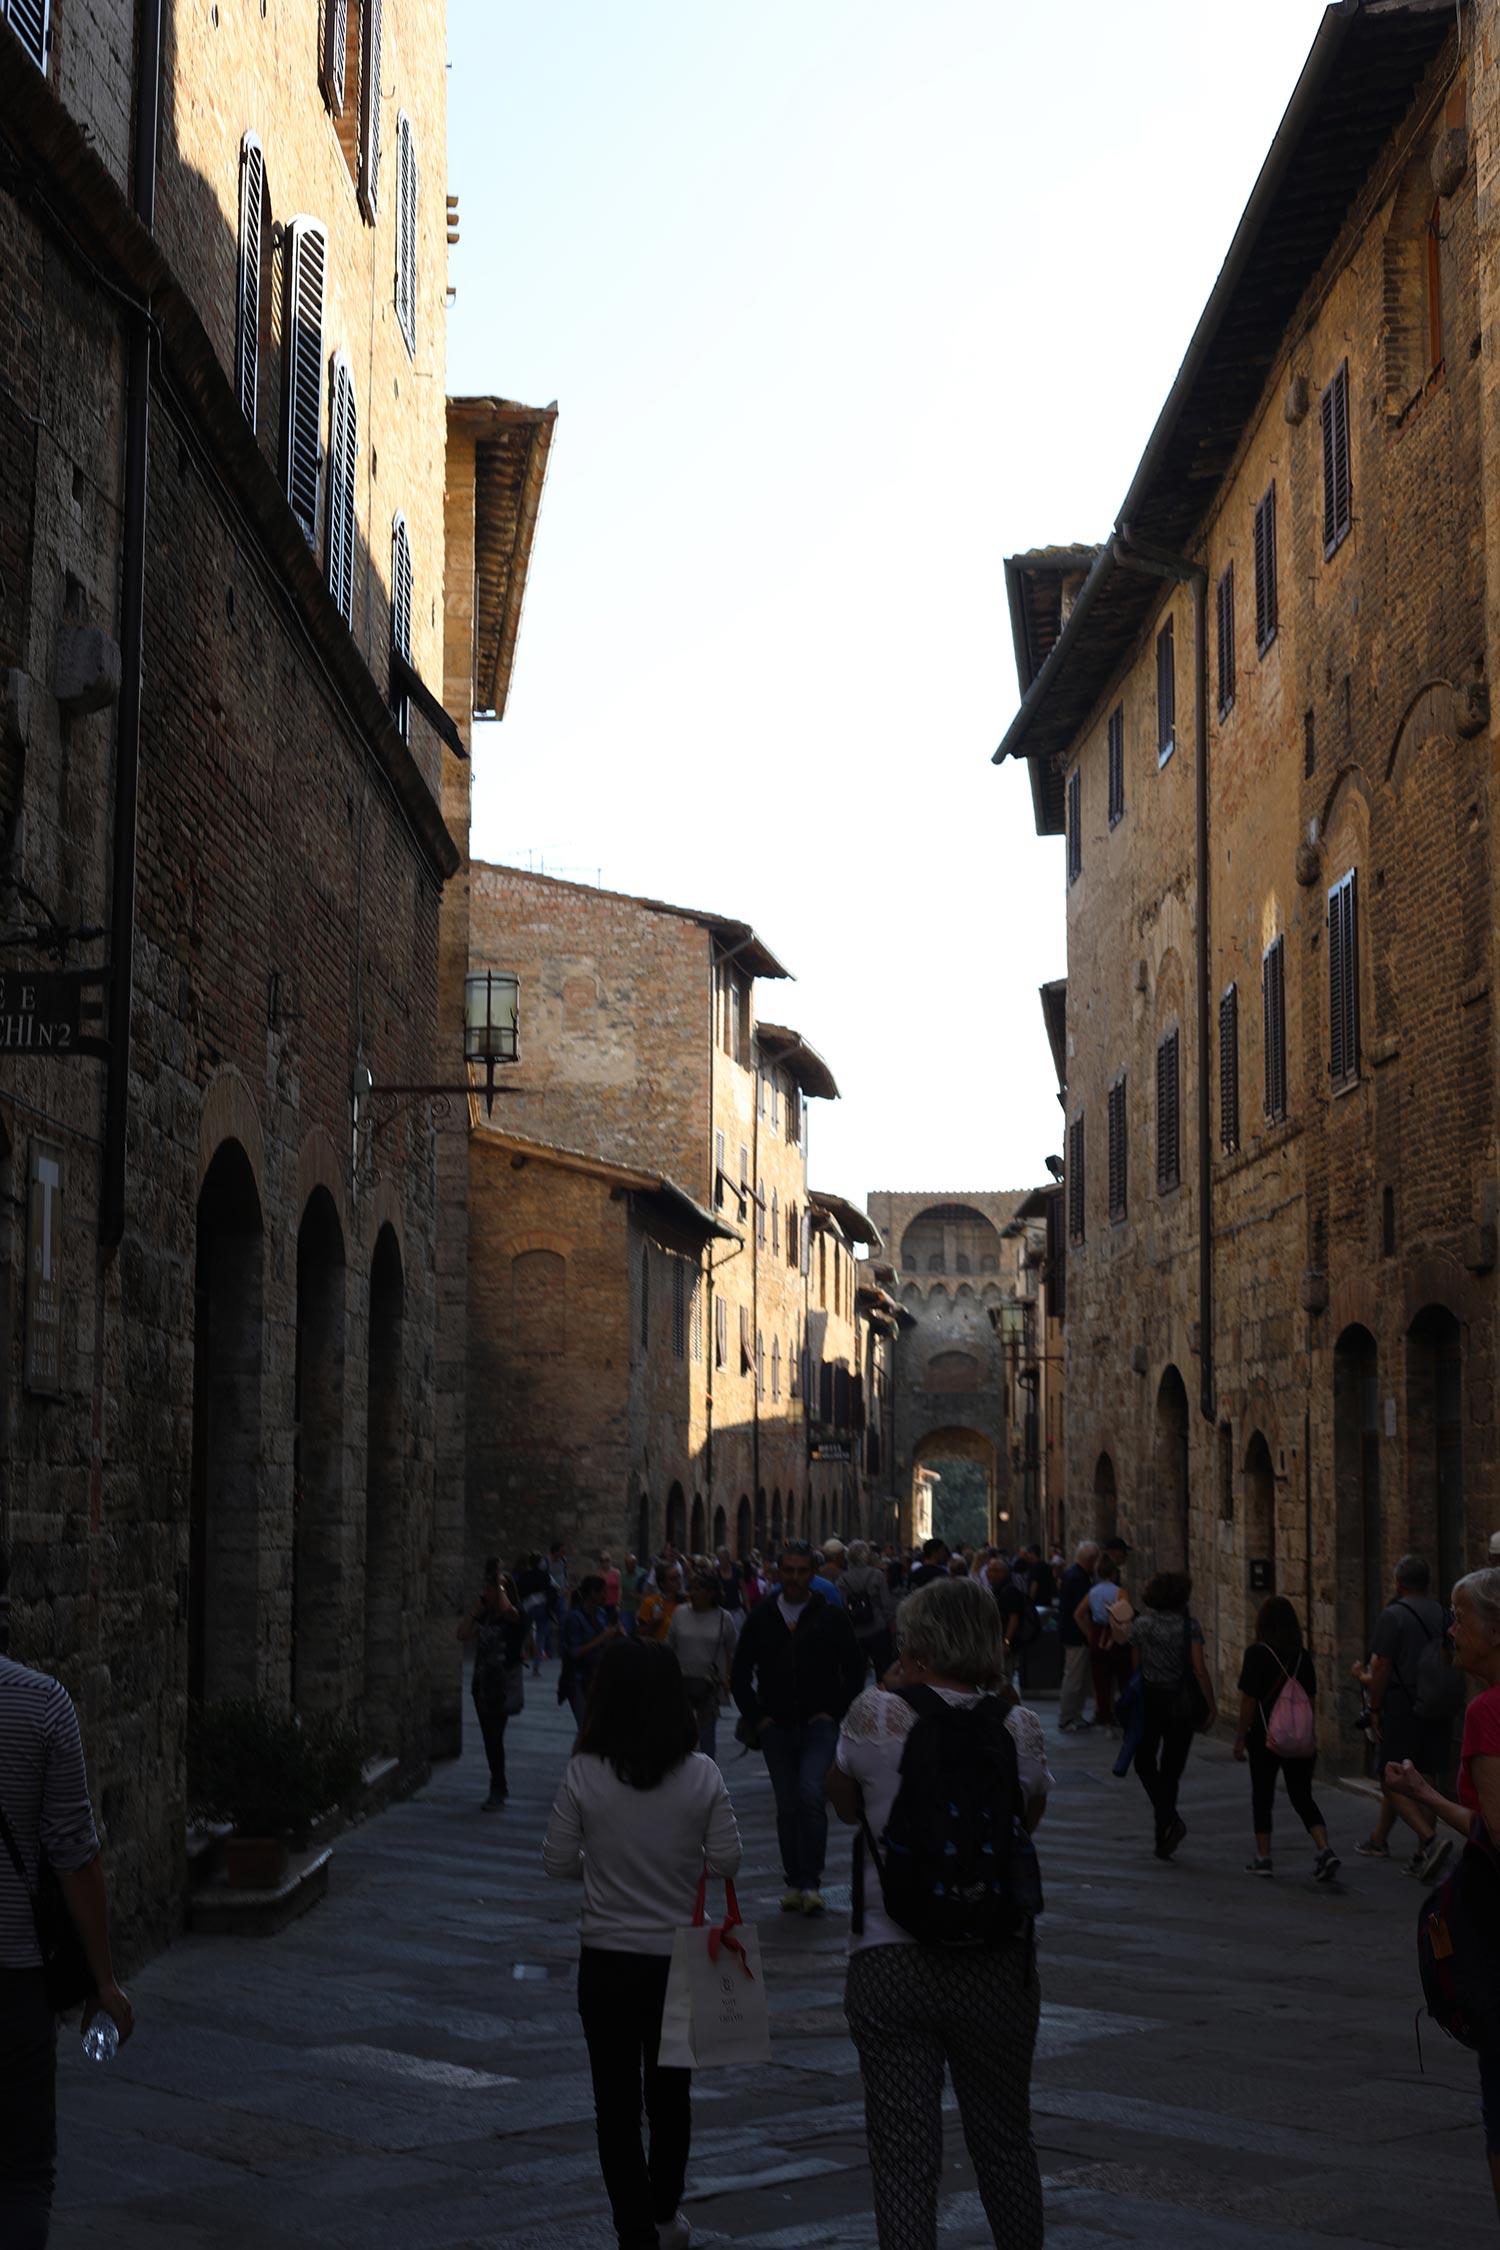 Pilgrimage_Rome_4240_SG.jpg